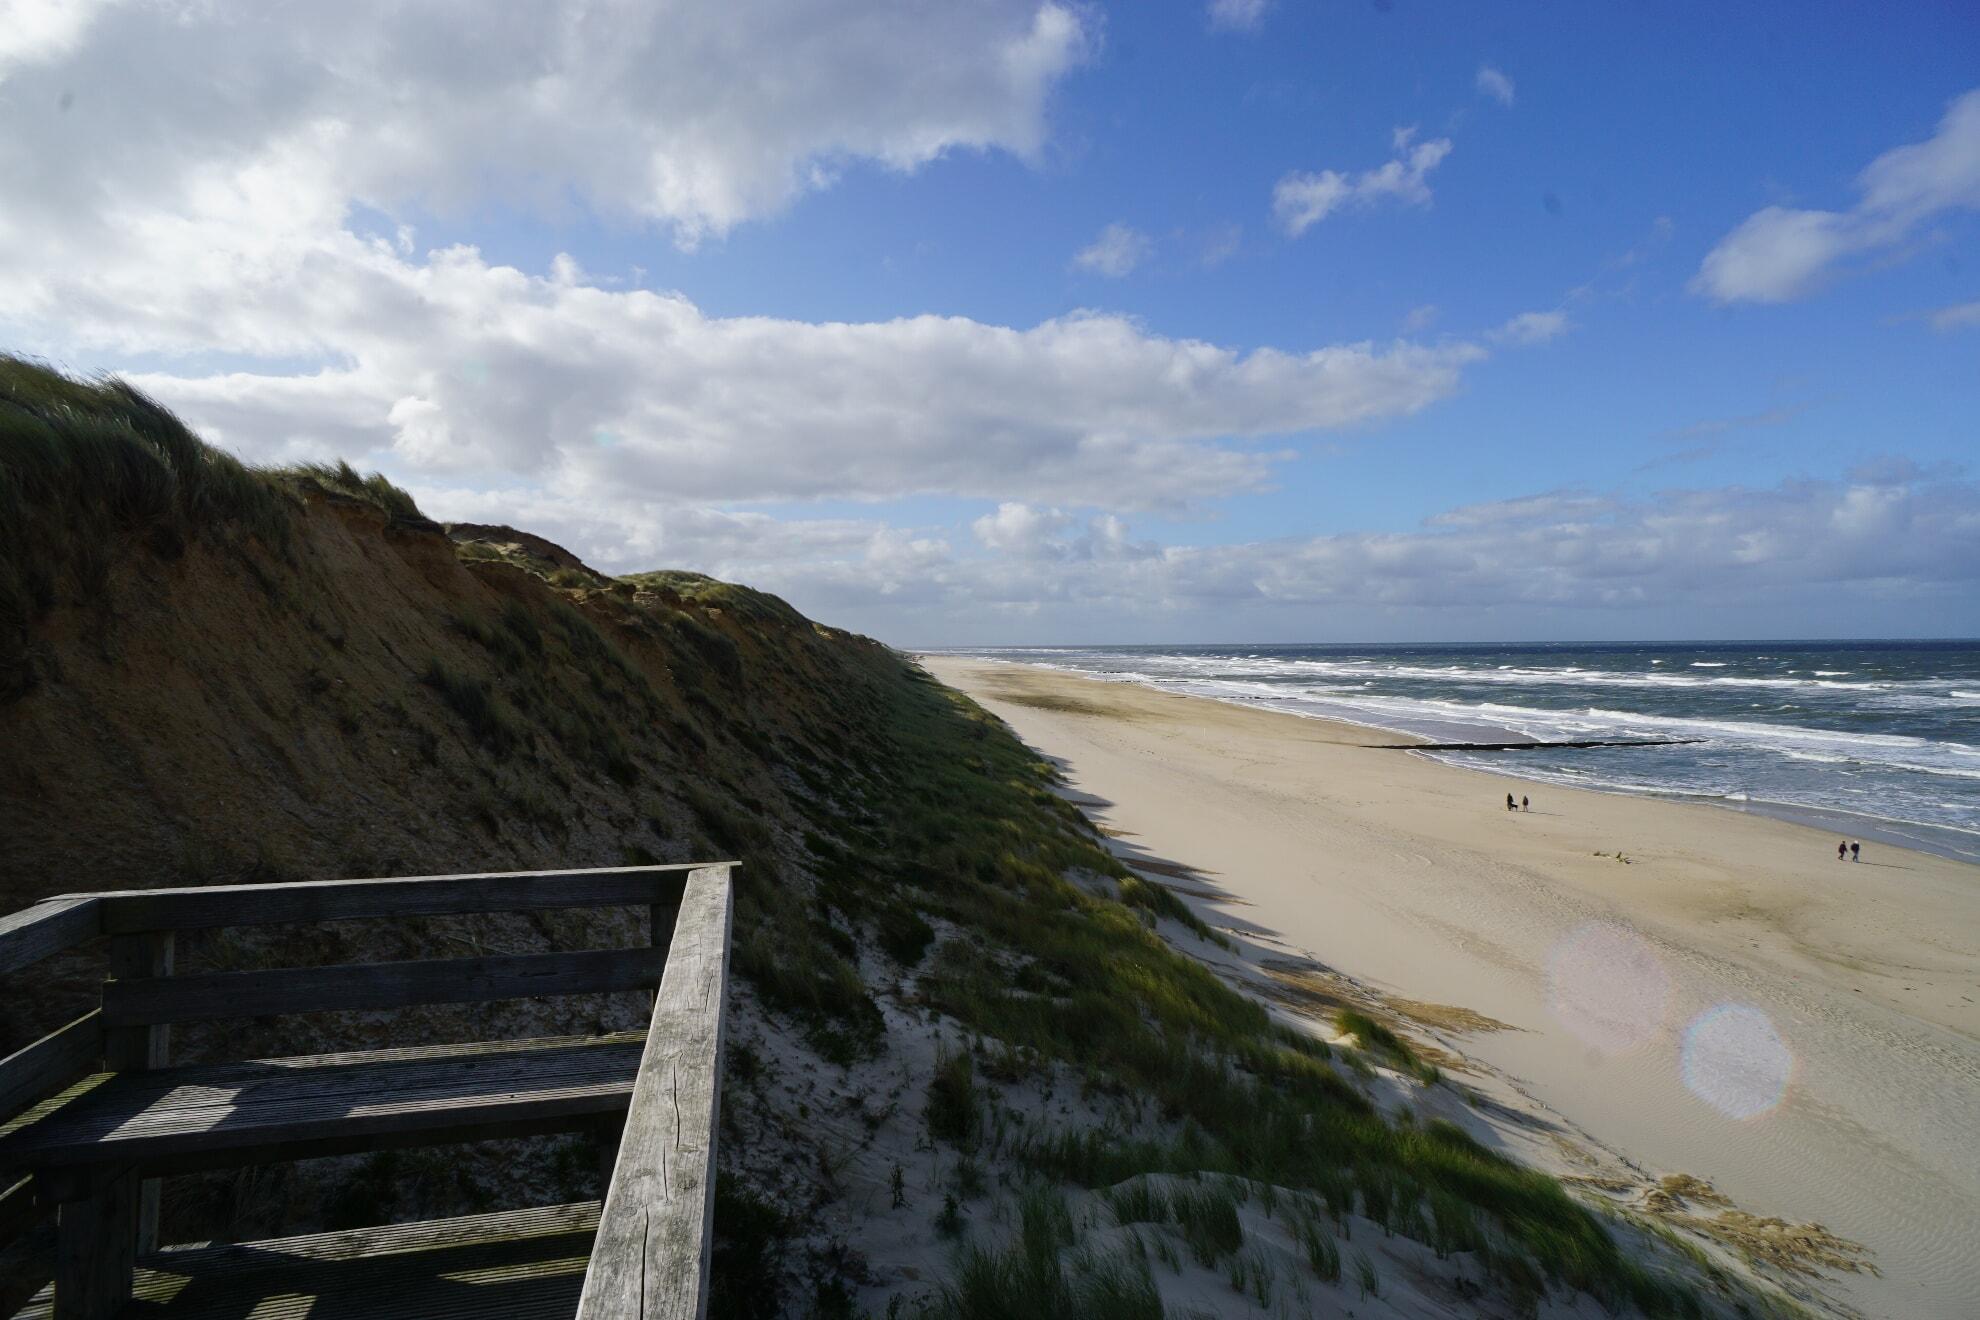 Strandübergang am Campingplatz in Kampen